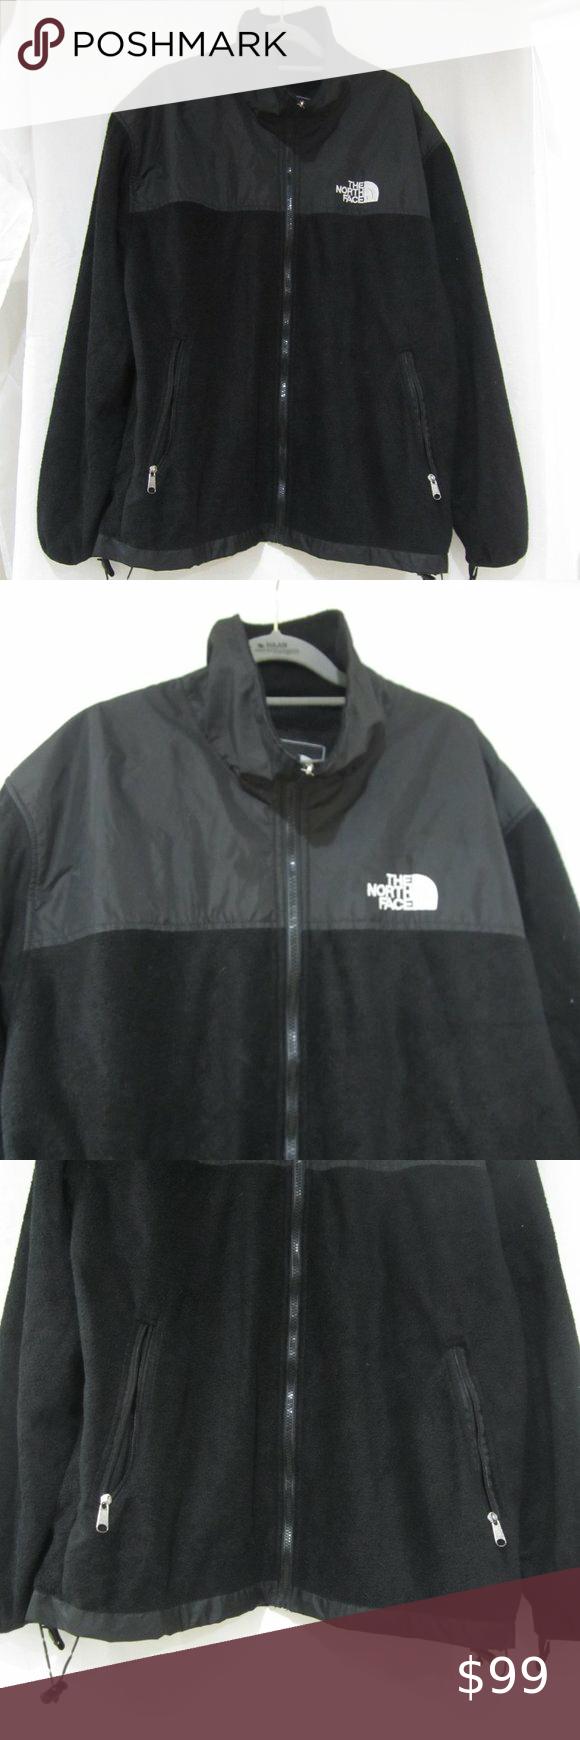 The North Face Xl Summit Series Zip Jacket 50 C The North Face Jacket Xl Black Full North Face Jacket Mens Black North Face Jacket North Face Hooded Jacket [ 1740 x 580 Pixel ]